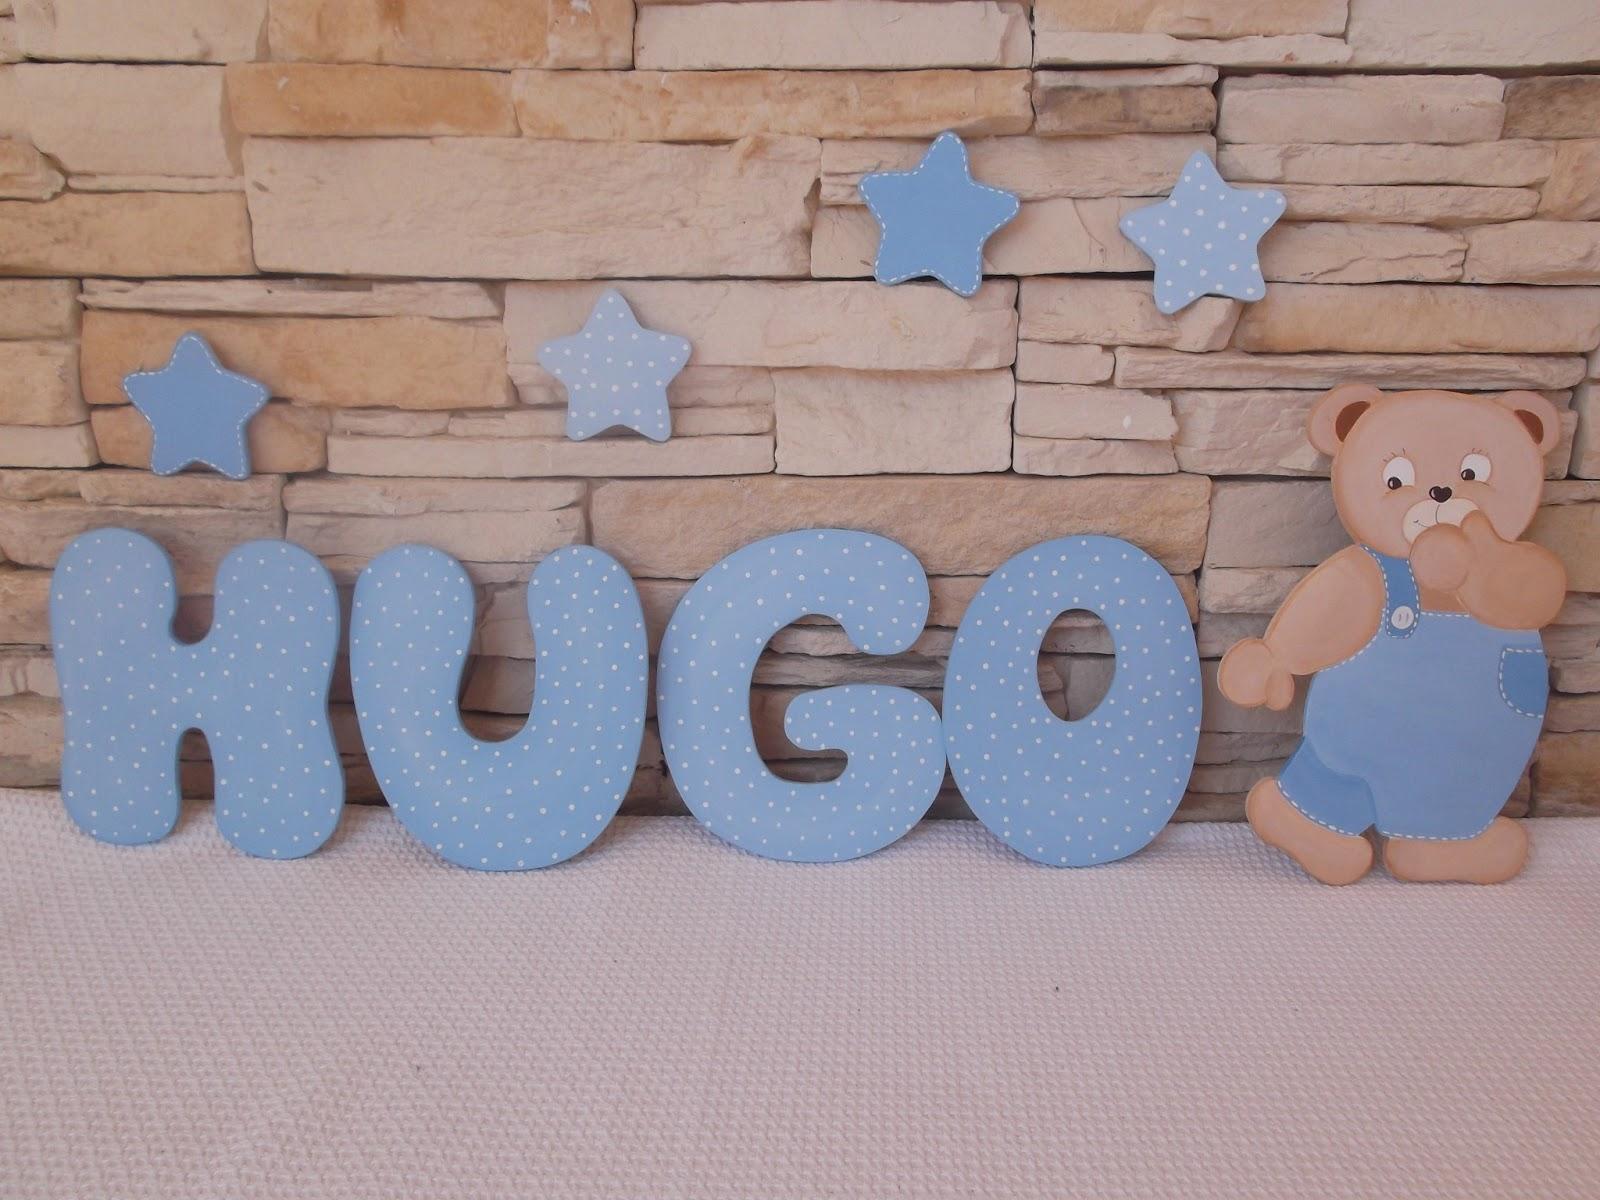 Decoracion letras de madera - Madera para decorar ...